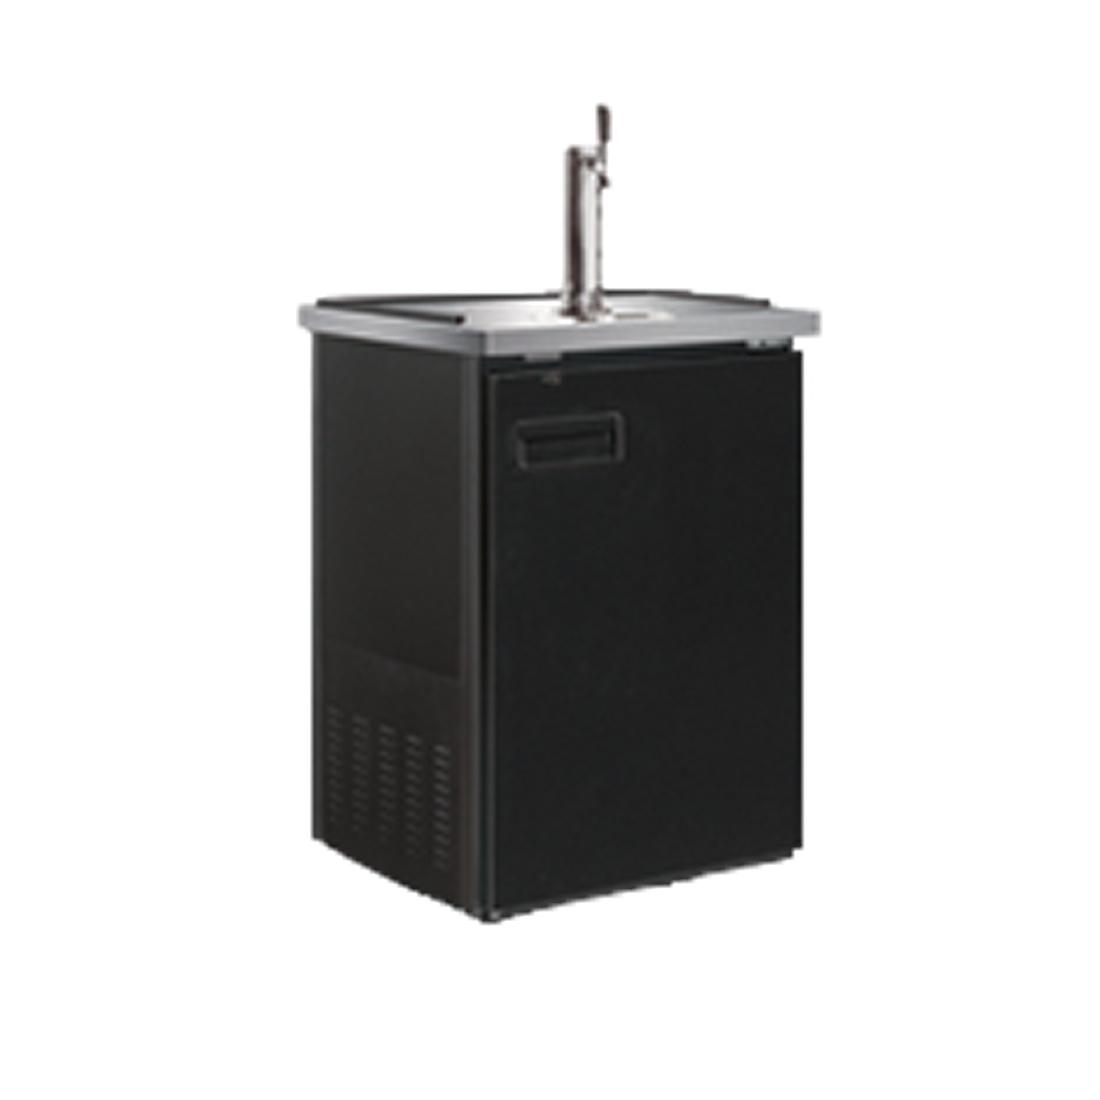 Single Door Underbar direct draw dispenser 1-barrel - UBD-1